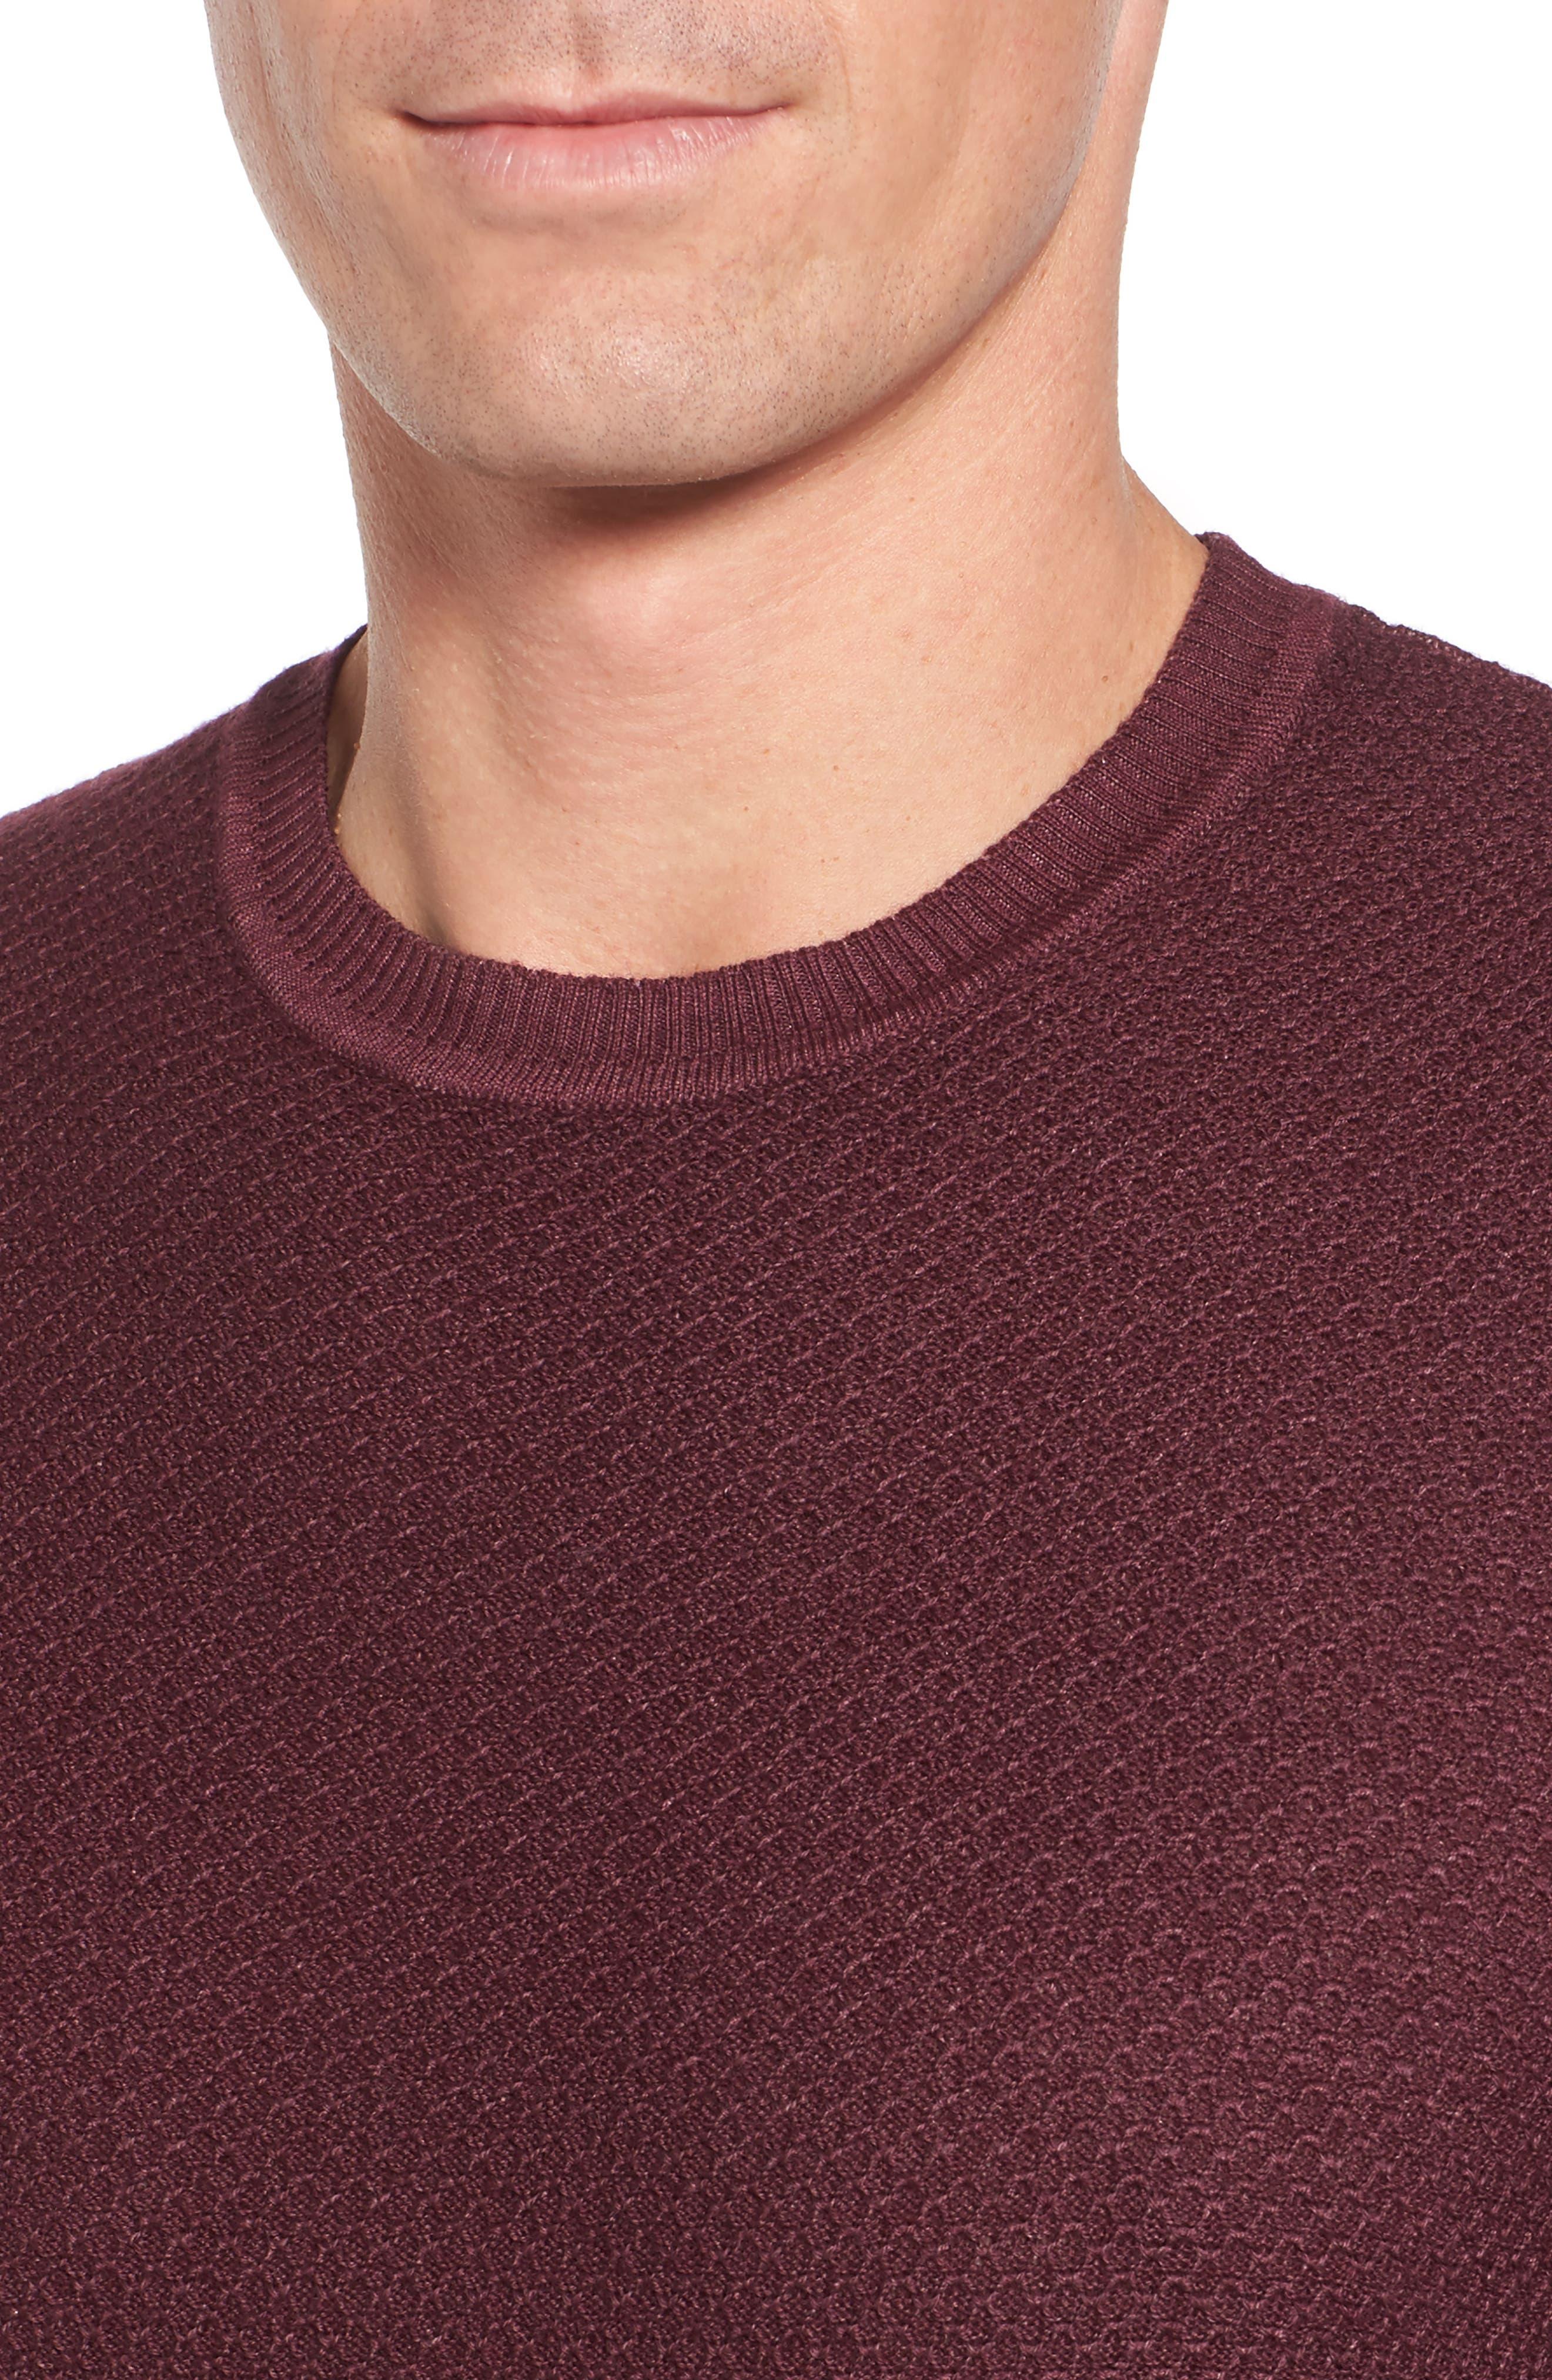 Honeycomb Merino Crewneck Sweater,                             Alternate thumbnail 4, color,                             Burgundy